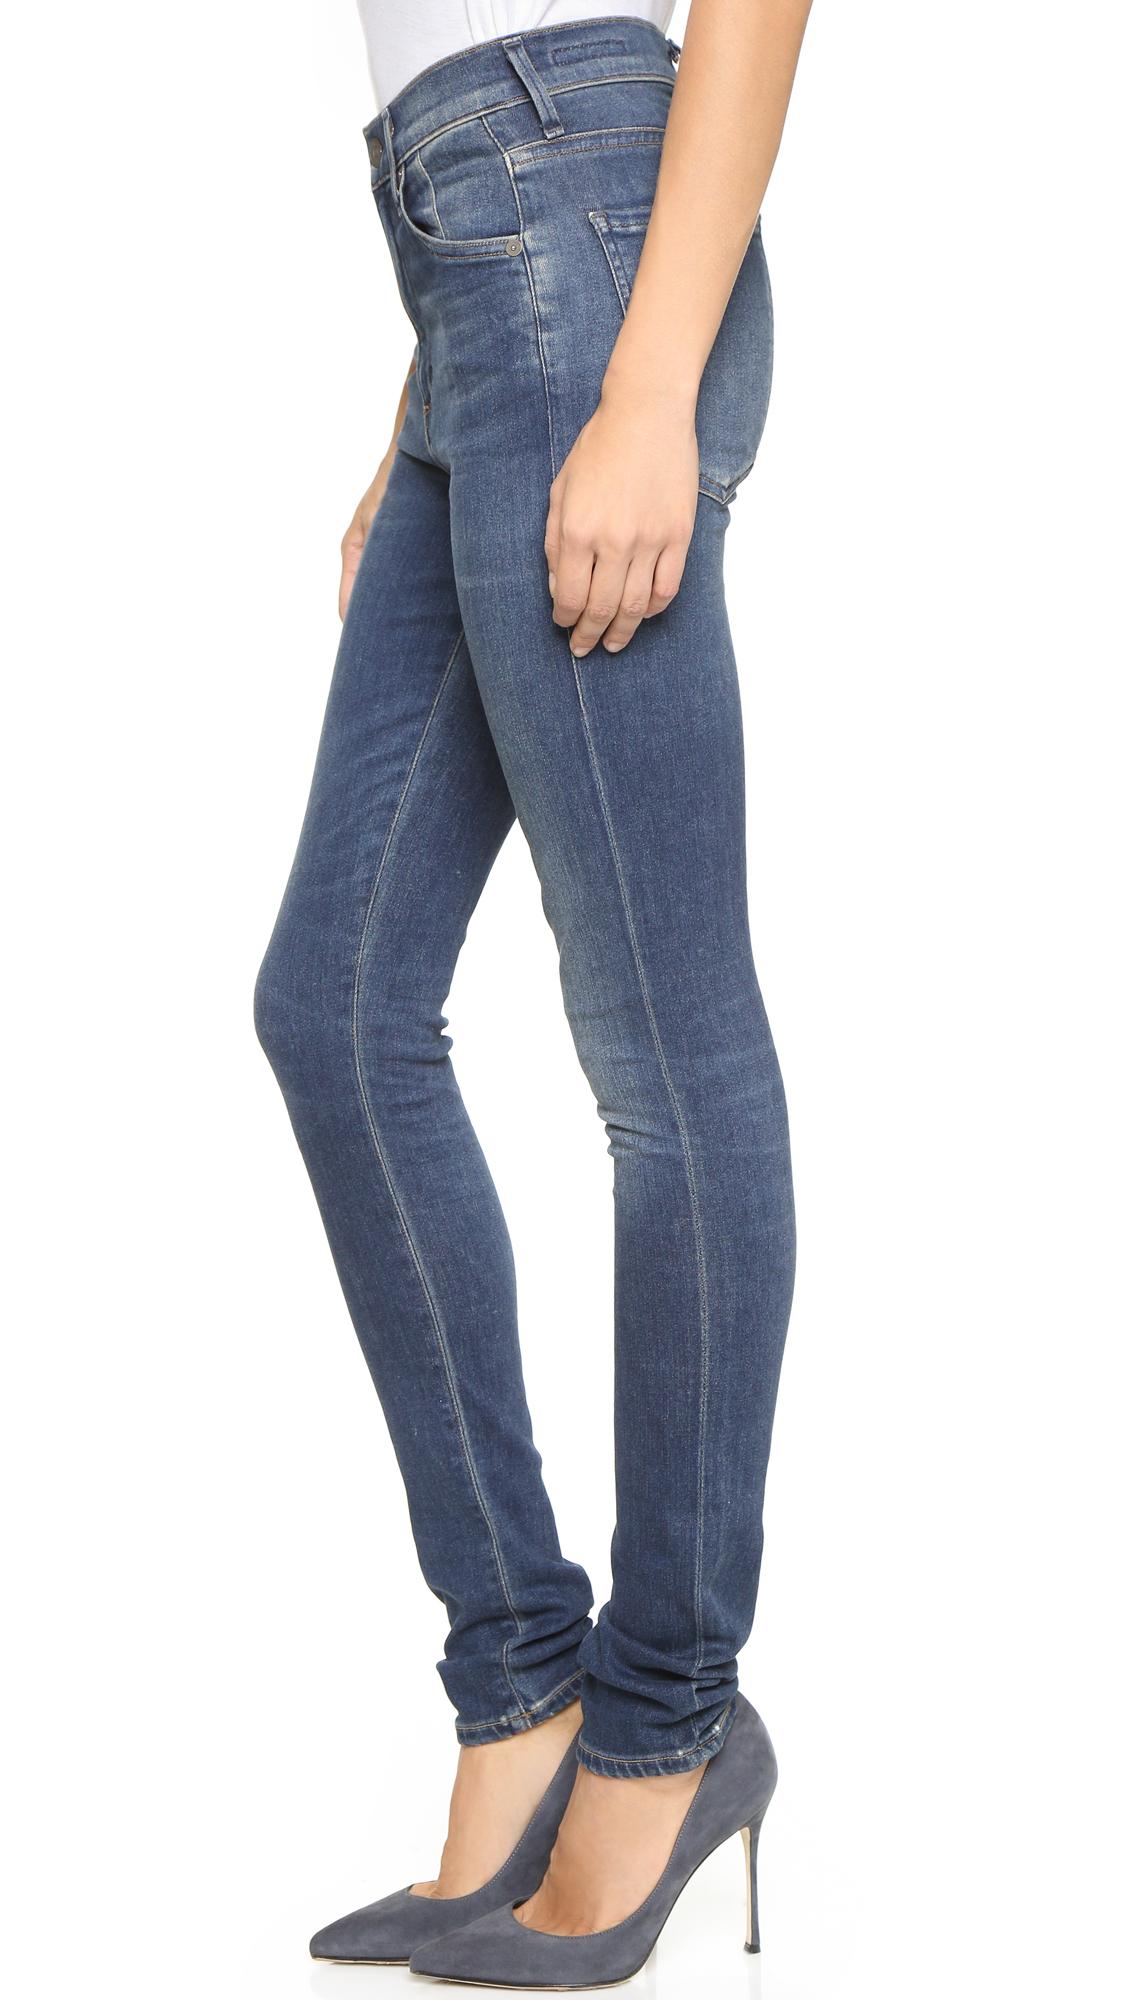 citizens of humanity carlie skinny sculpt jeans nemesis. Black Bedroom Furniture Sets. Home Design Ideas